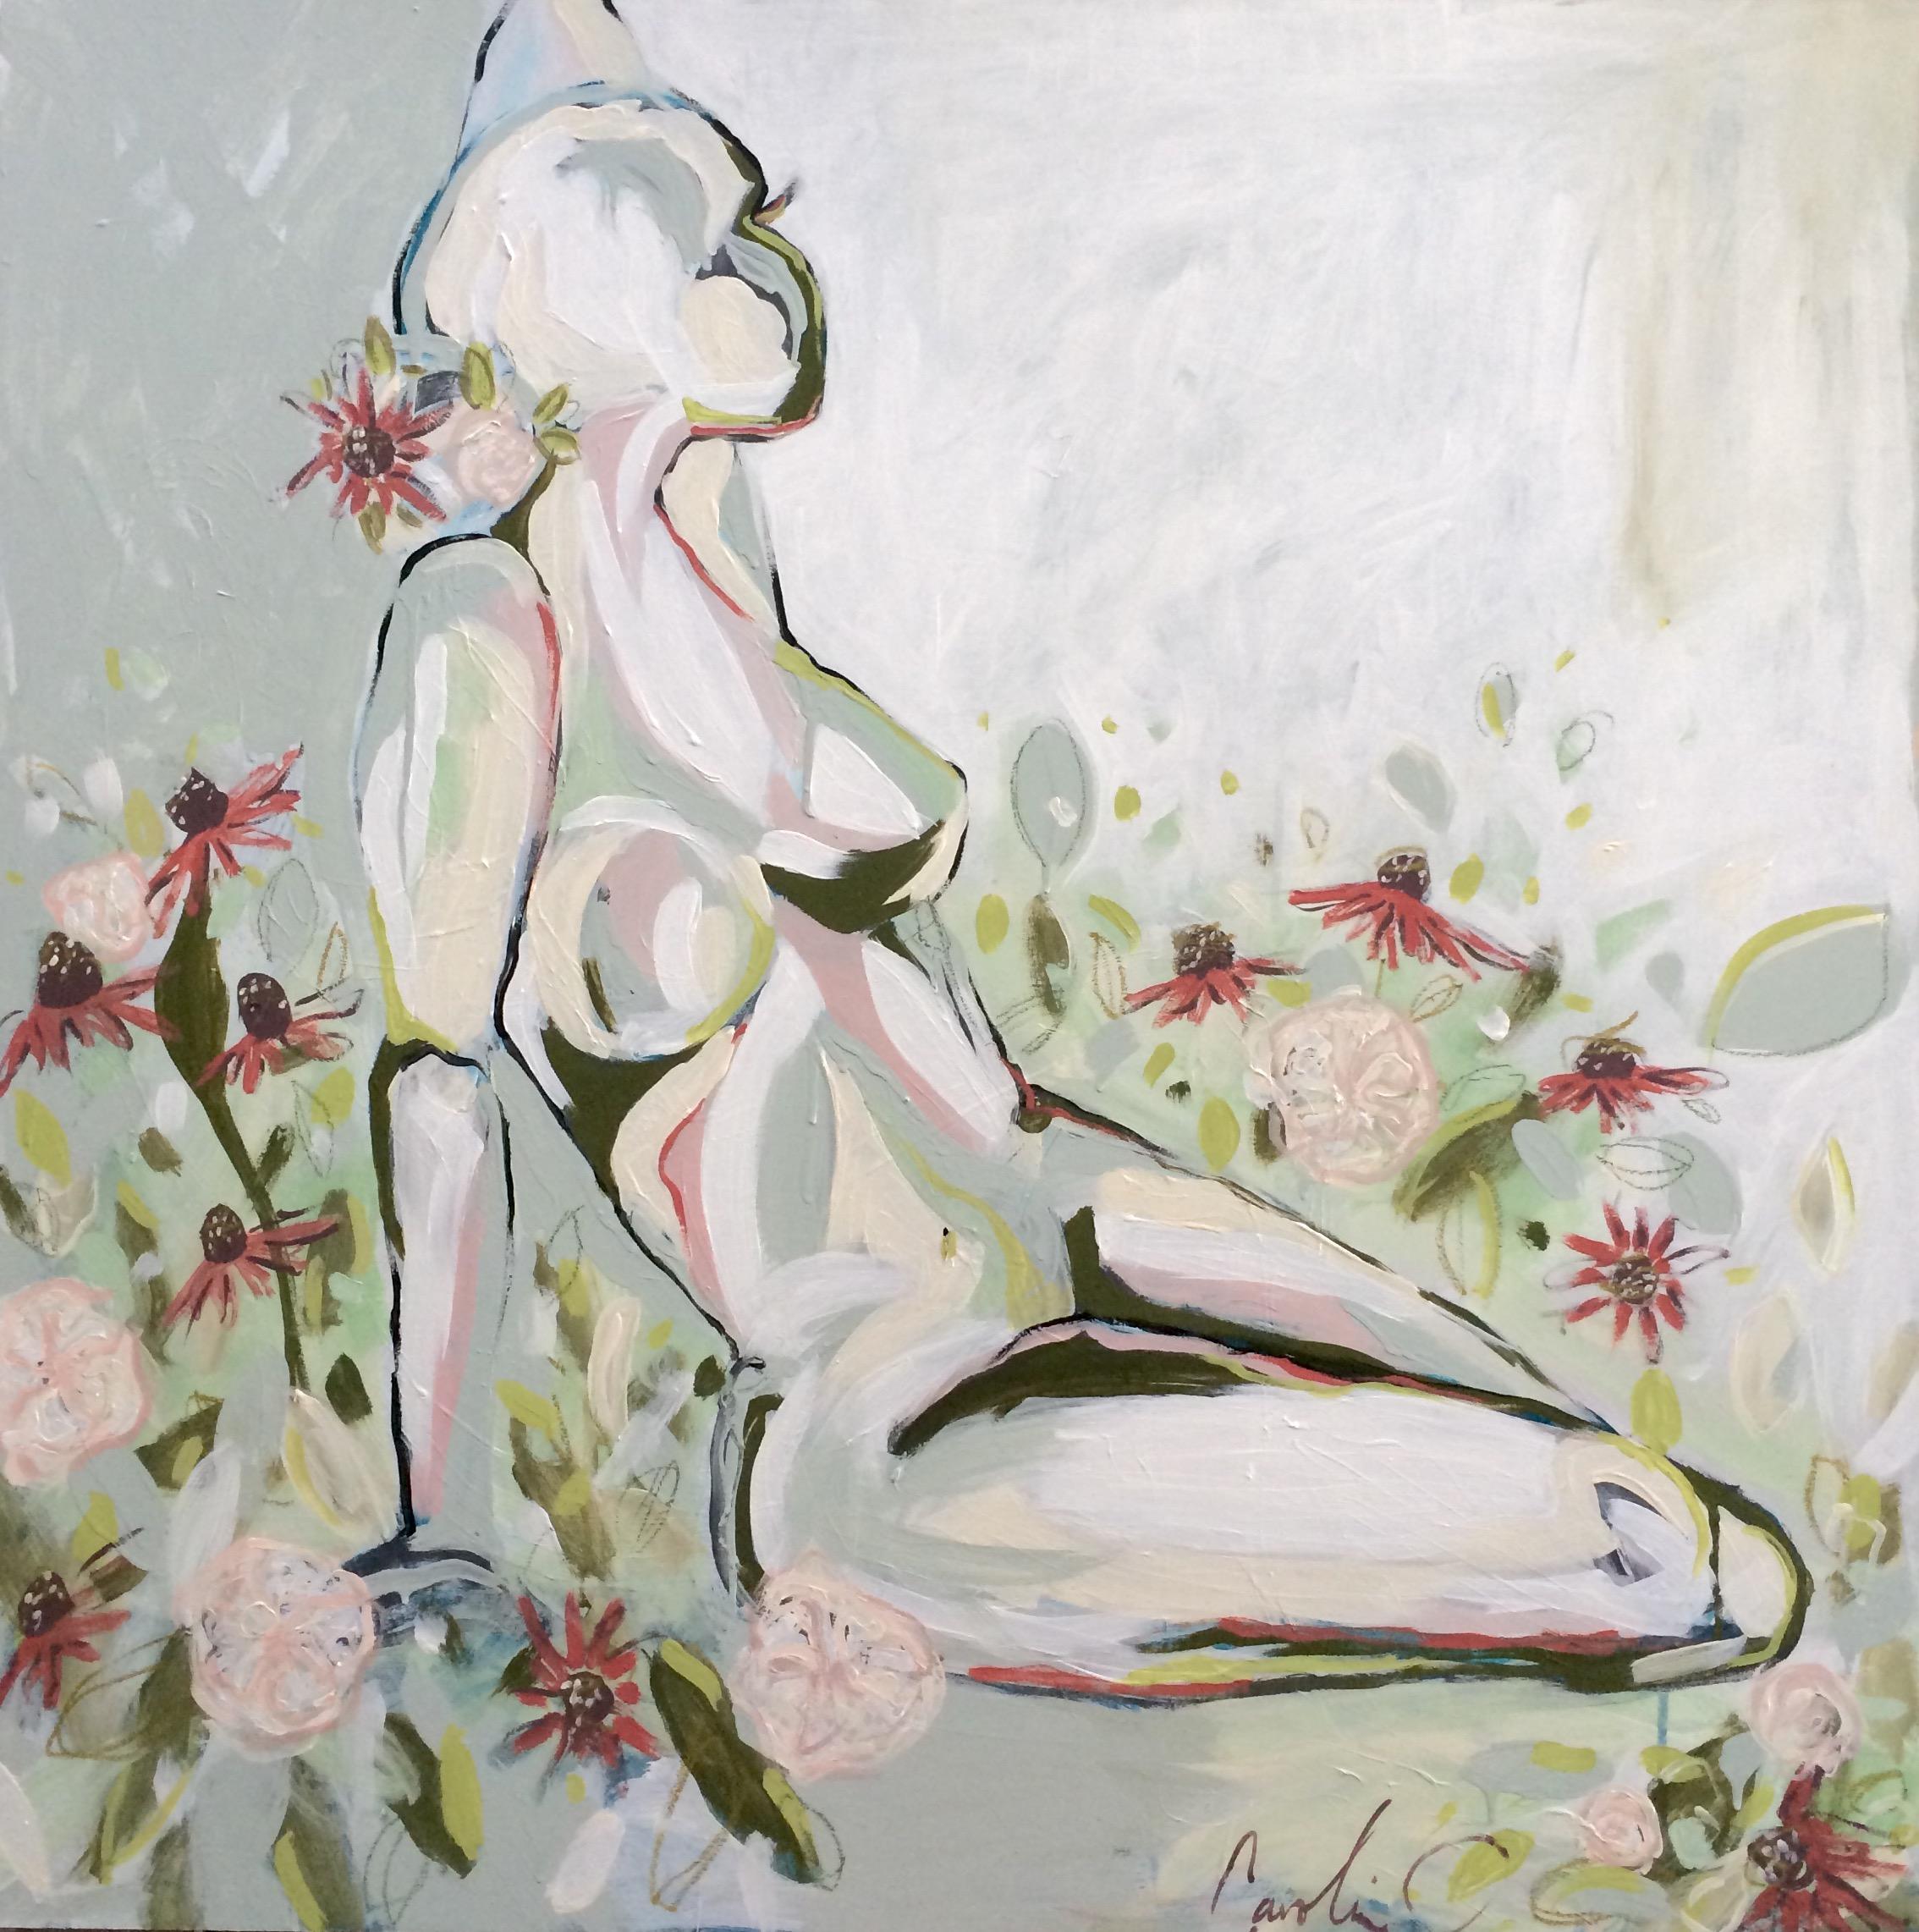 Garden Roses & Blush Nude 30x30 birch panel